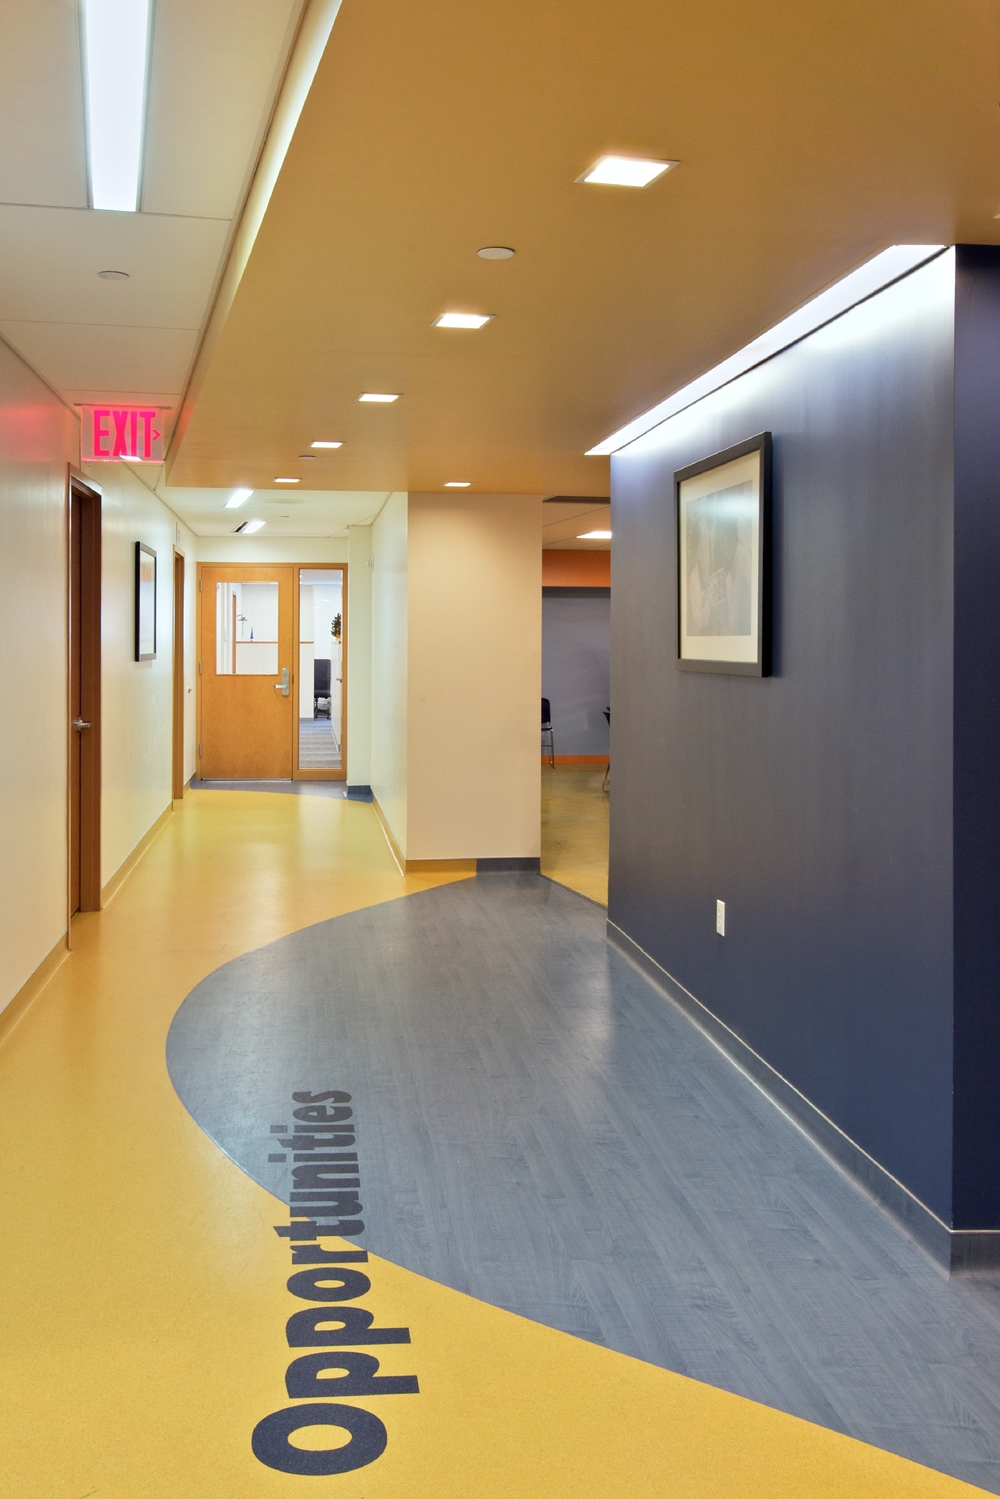 Per Scholas Headquarters. Tobin Parnes Design. Queens, New York. Cultural and Institutional. Corridor.